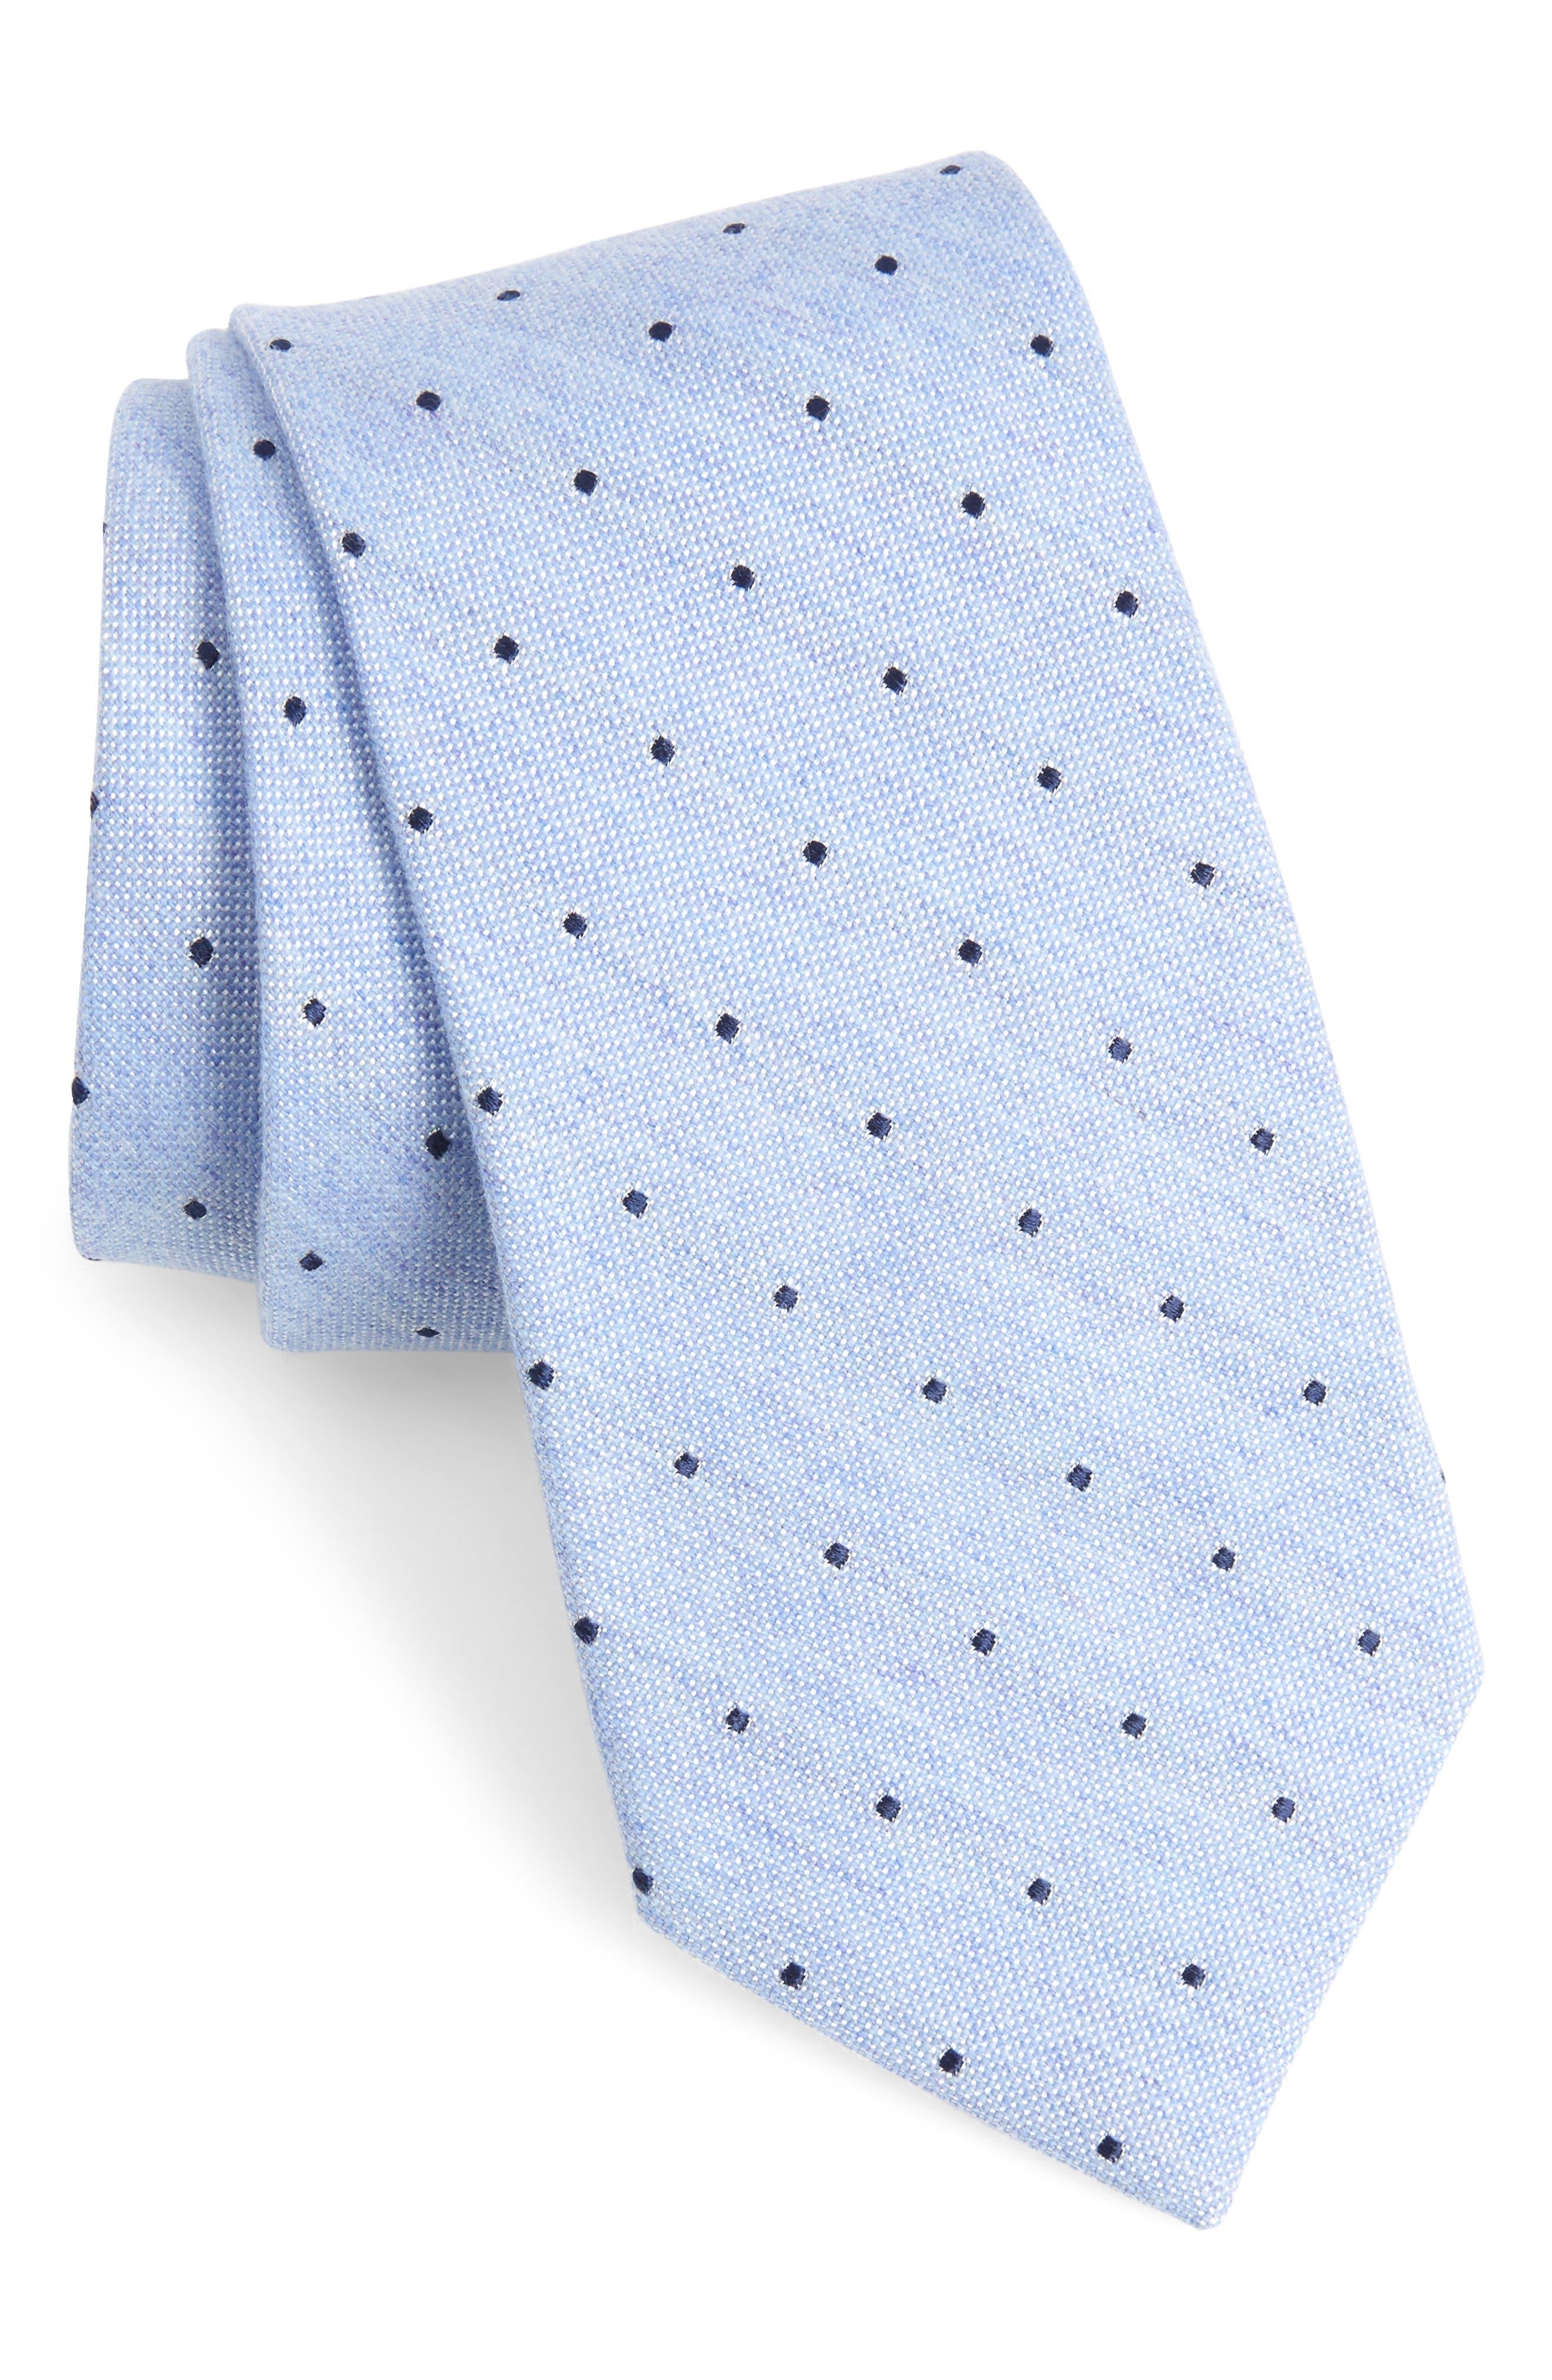 Horizon Dot Wool Blend Tie,                             Main thumbnail 1, color,                             BLUE